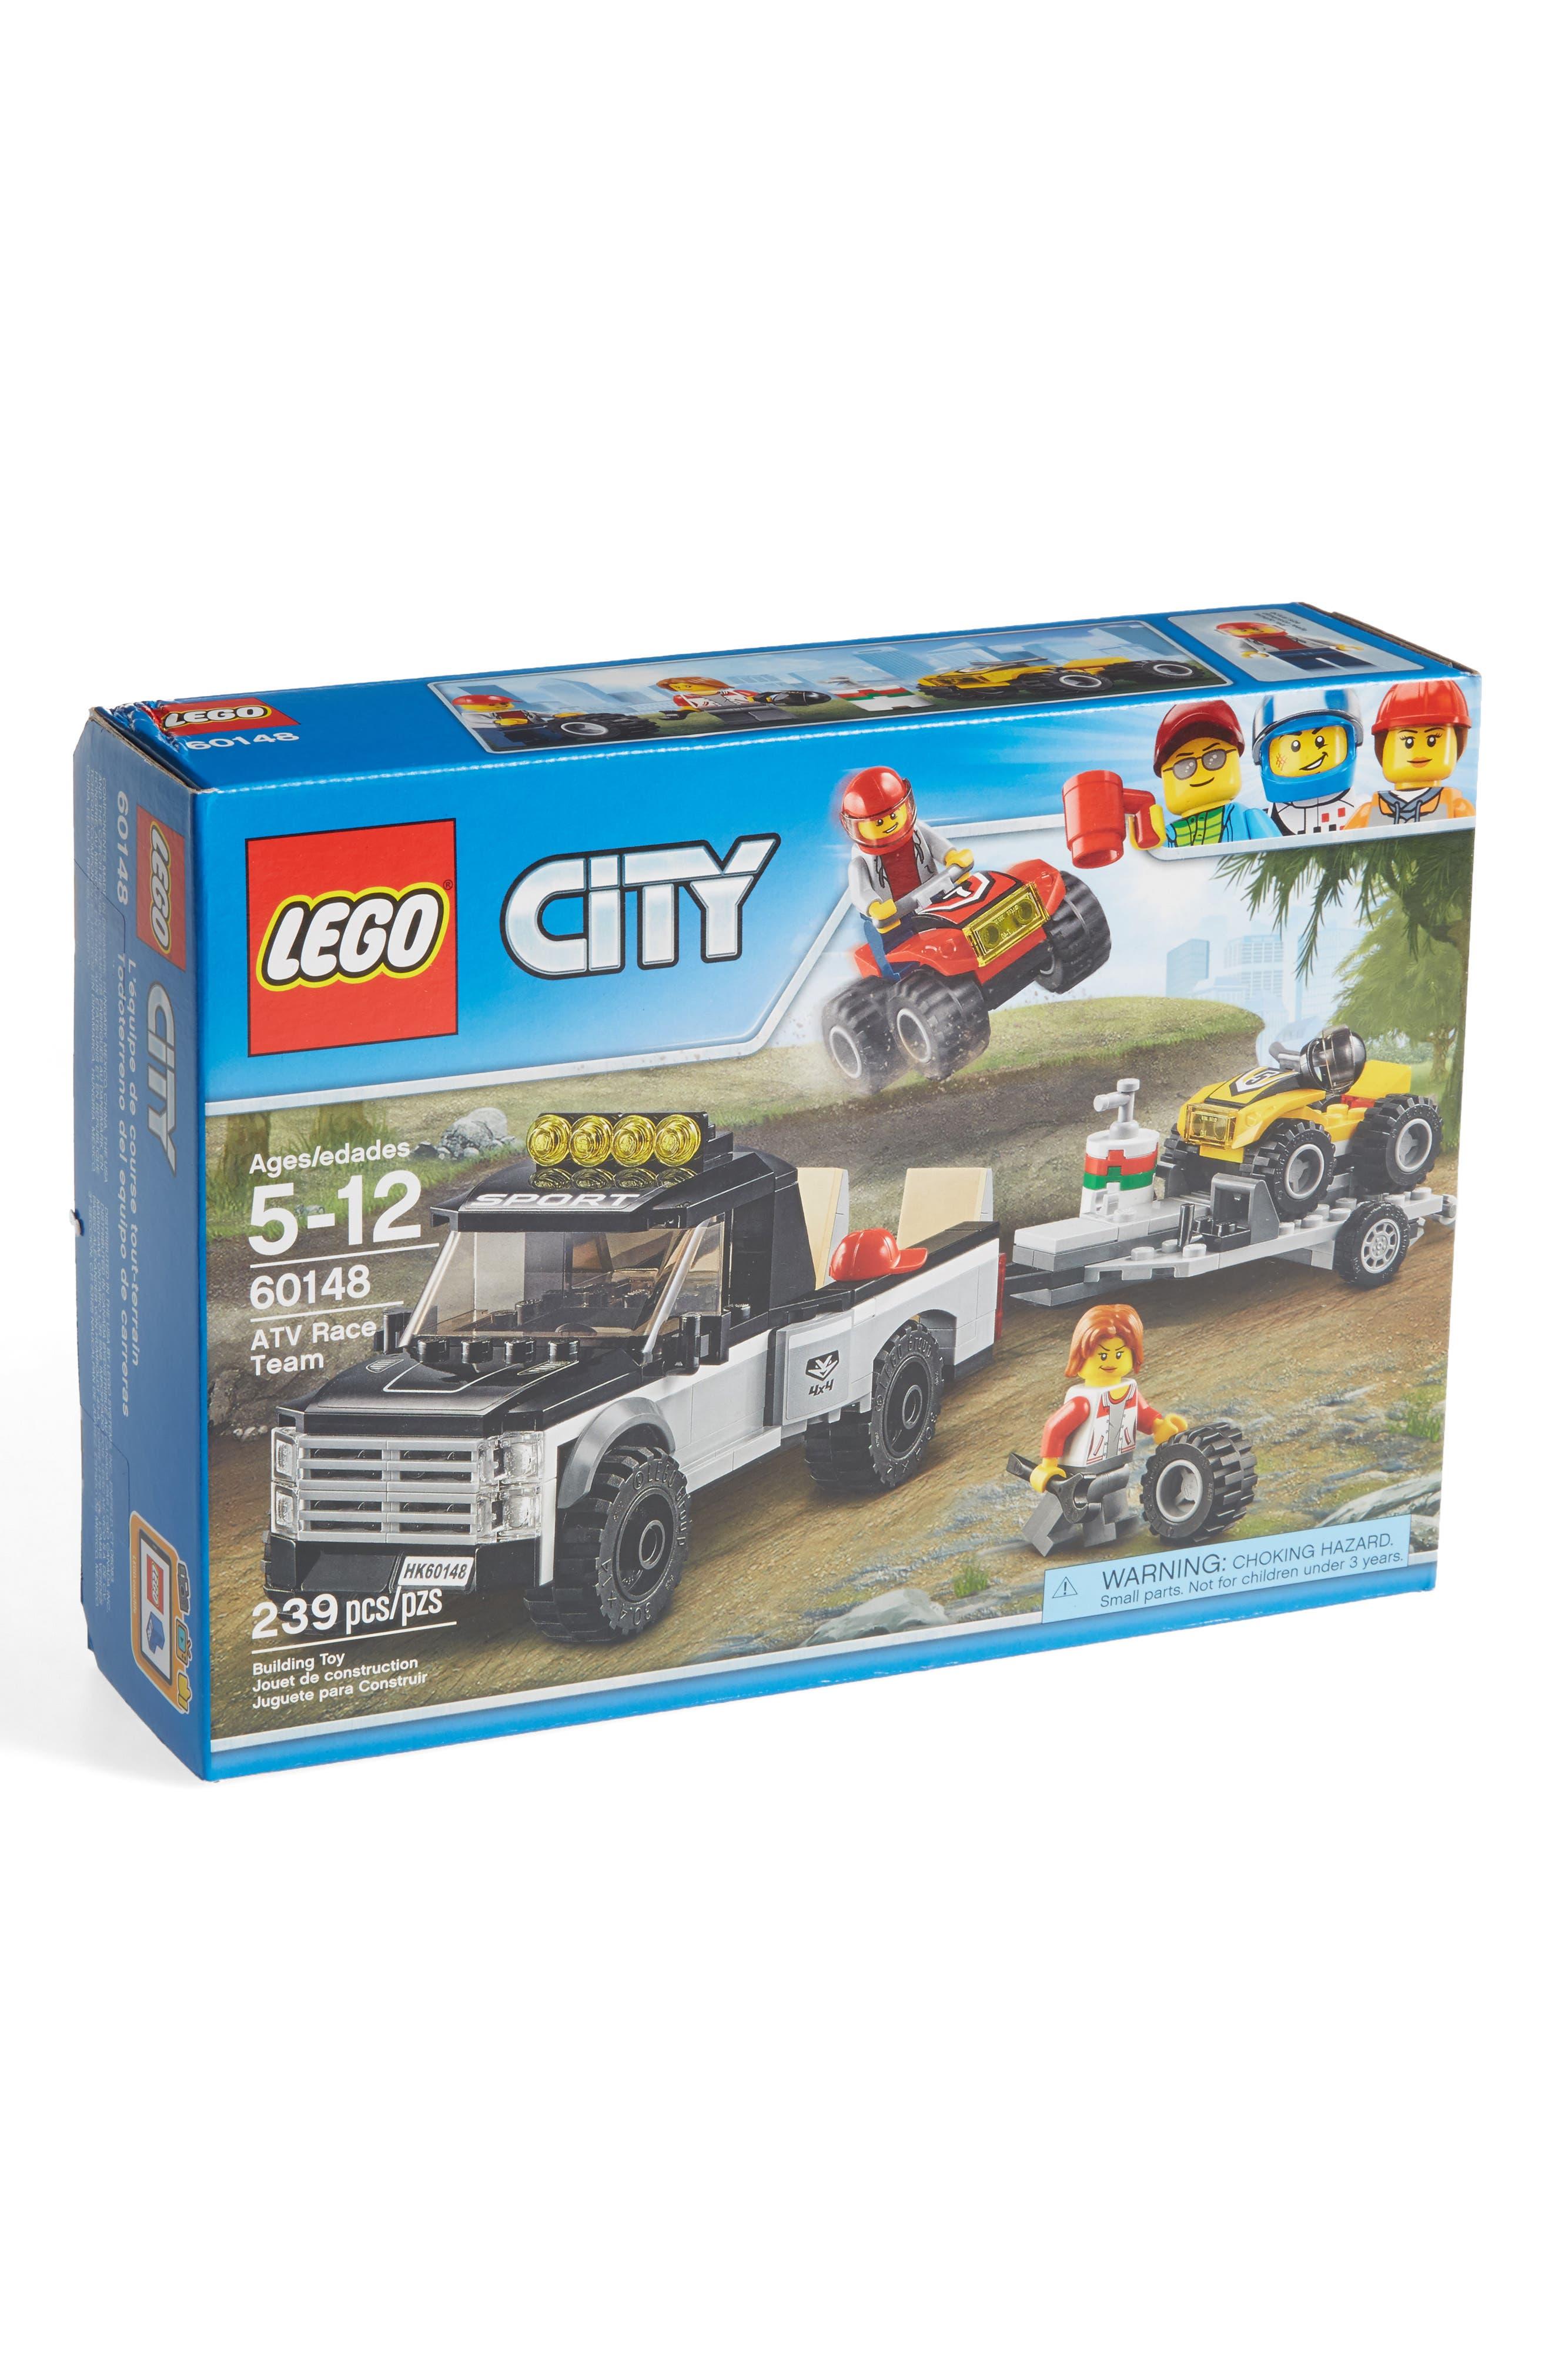 City ATV Race Team - 60148,                         Main,                         color, Blue